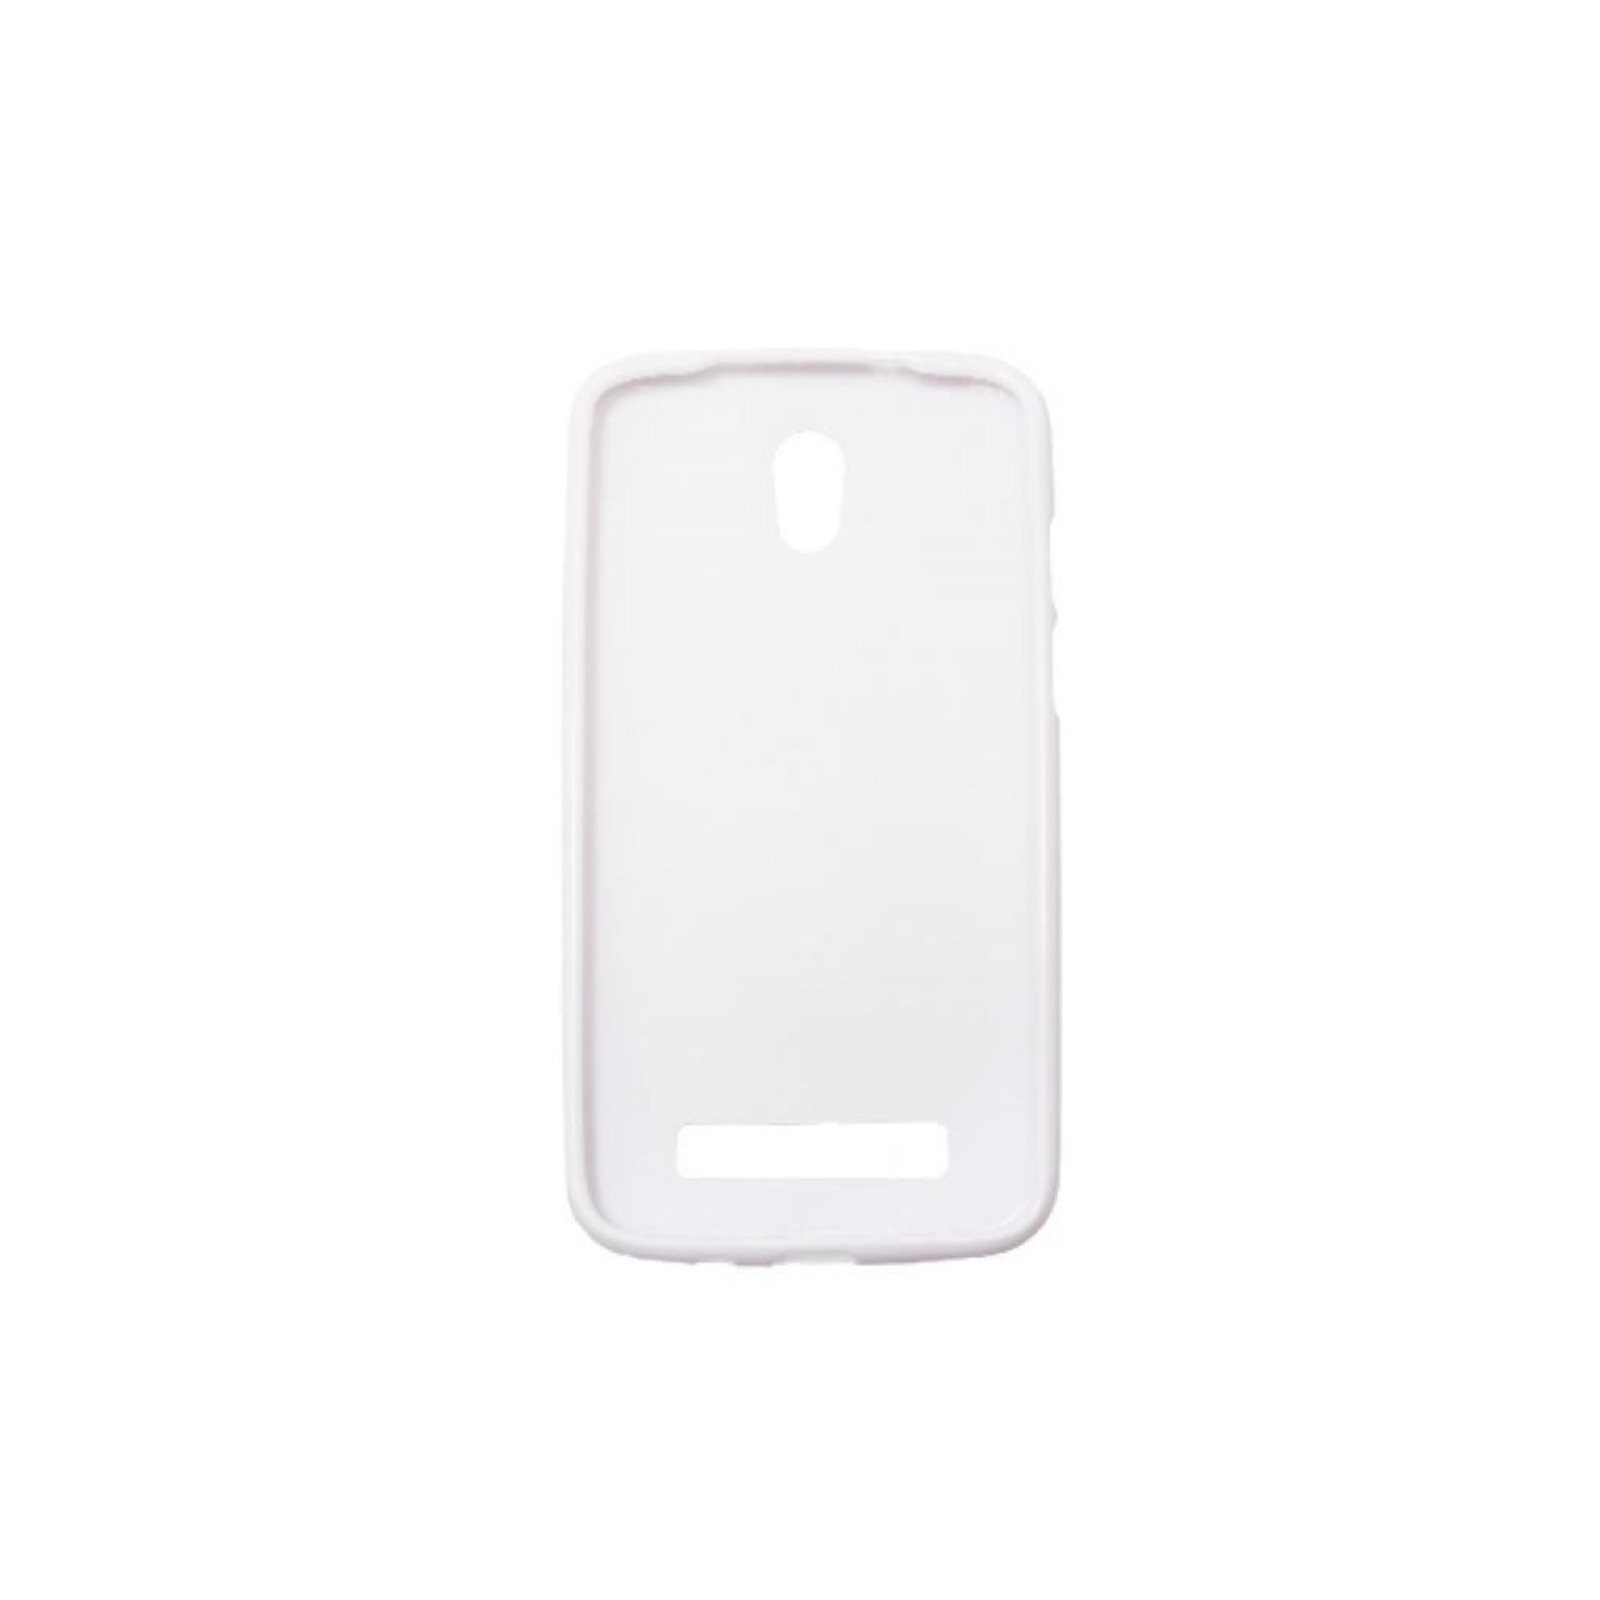 Чехол для моб. телефона Drobak для HTC Desire 500 /ElasticPU/White (218864) изображение 2